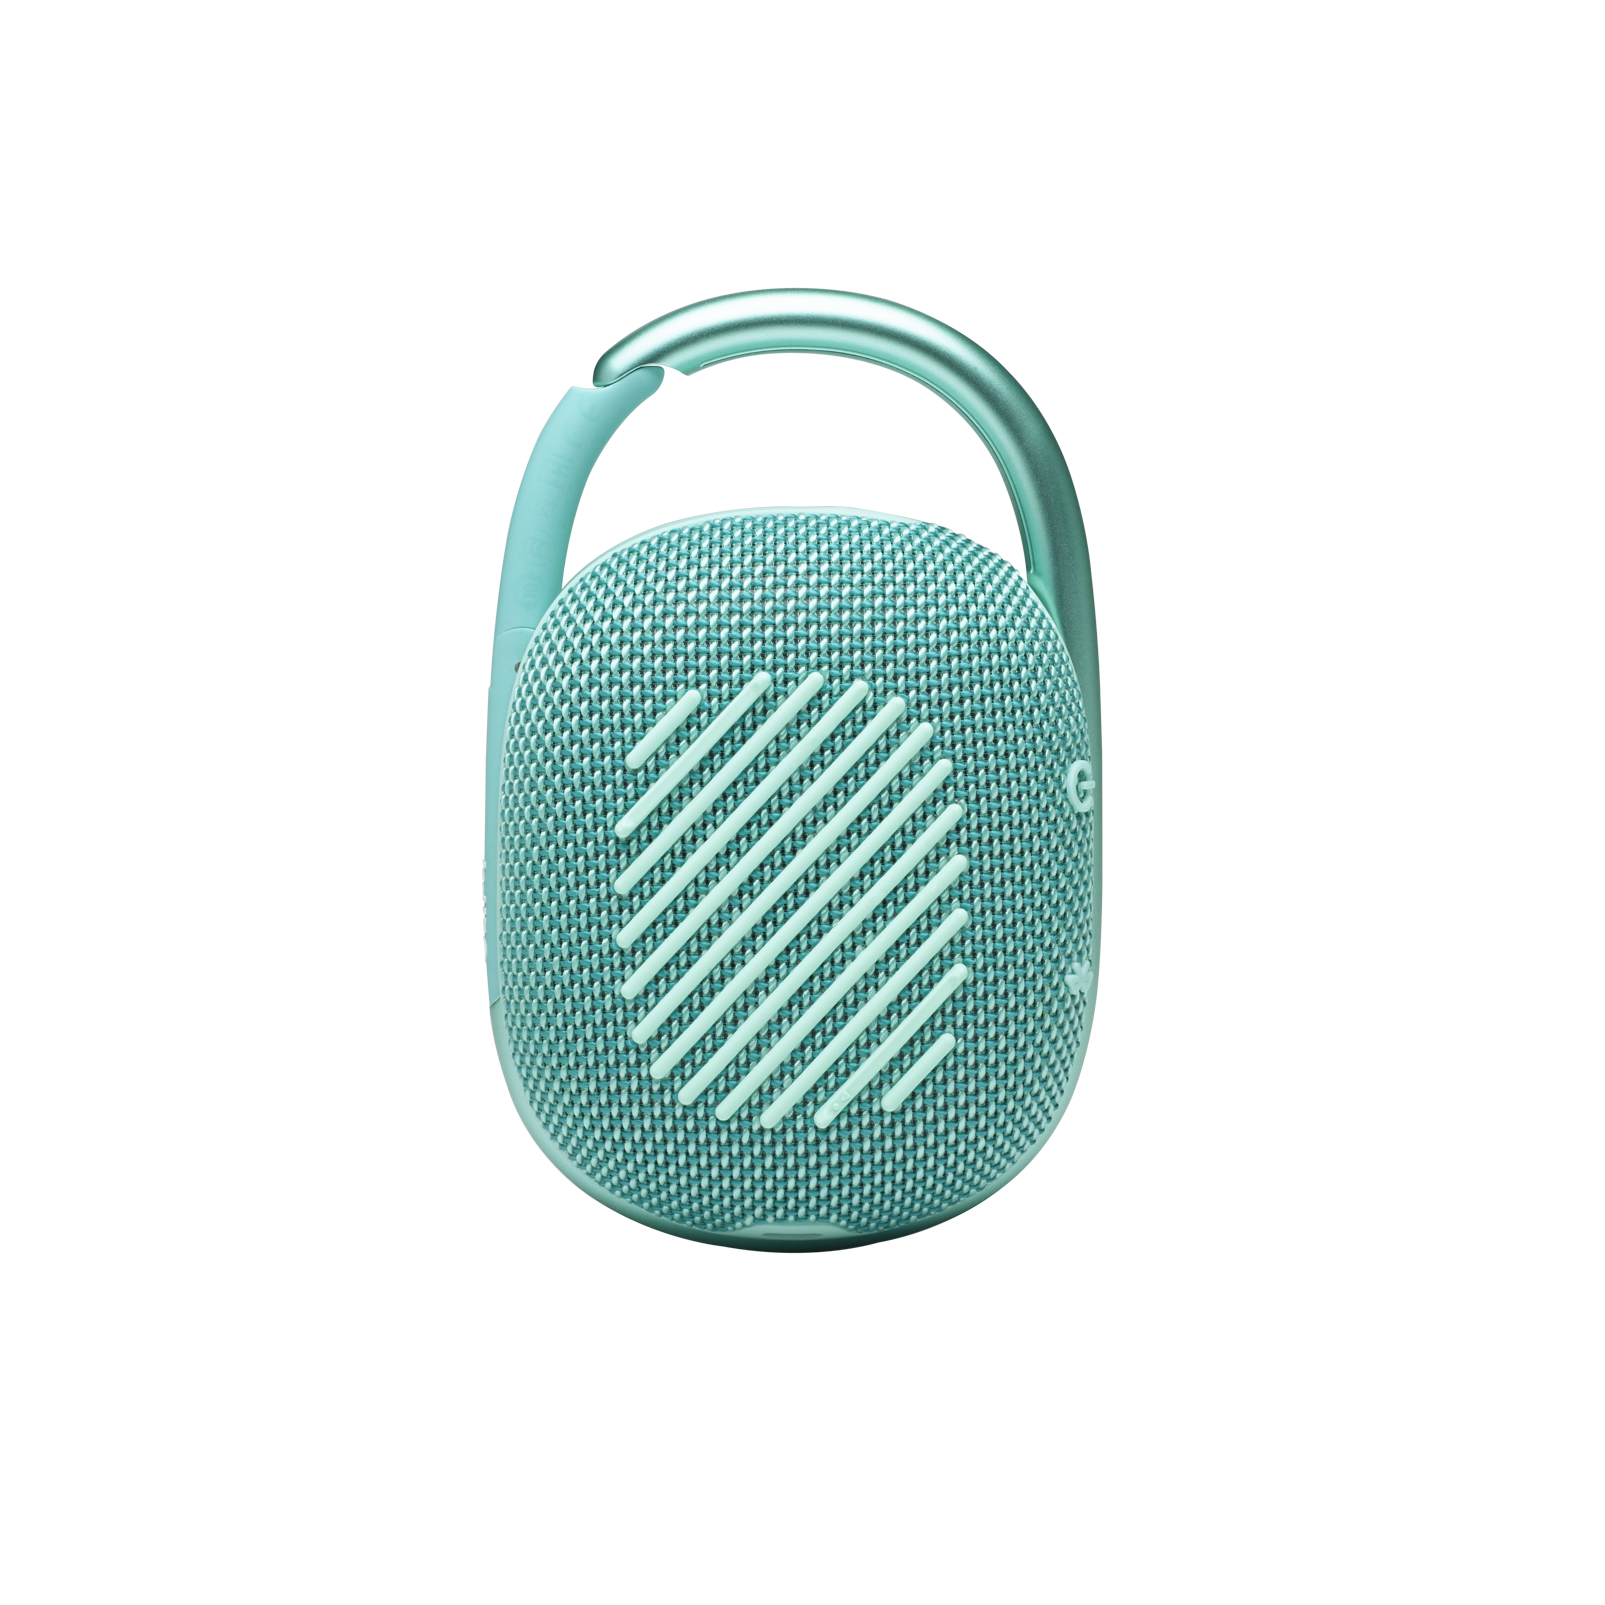 JBL CLIP 4 - Teal - Ultra-portable Waterproof Speaker - Back